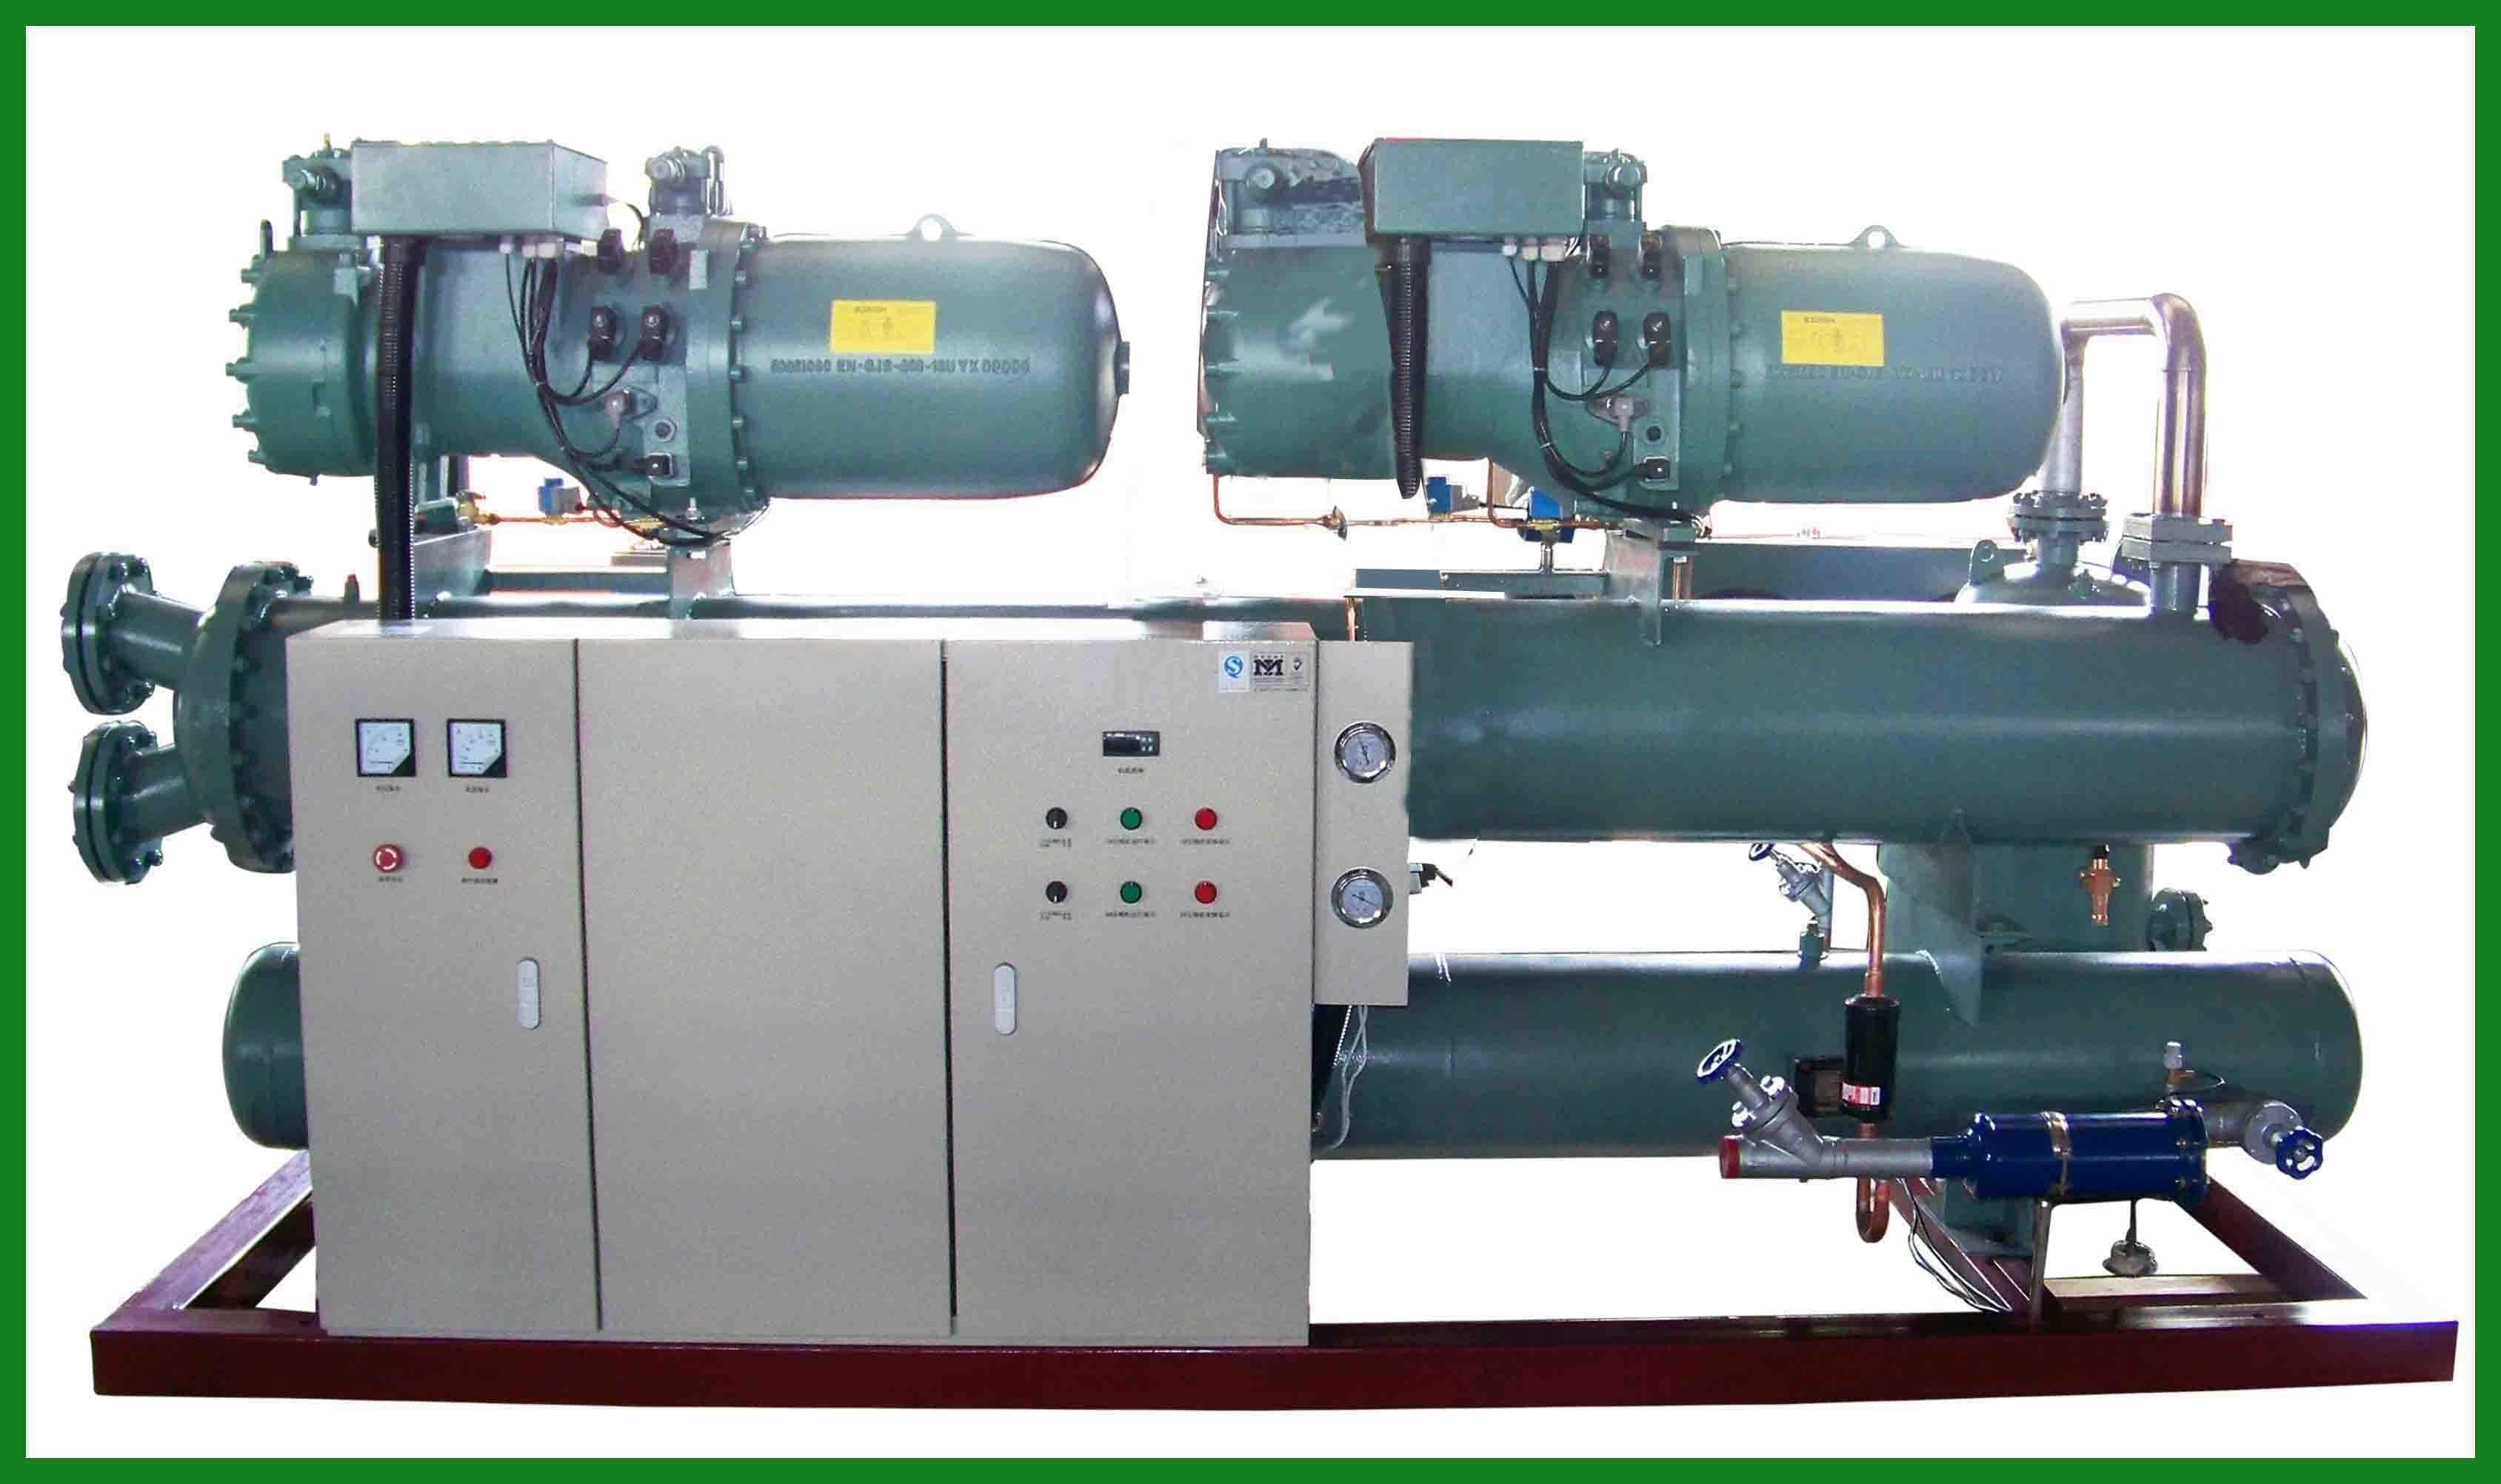 Refrigerator Compressor Compressor Used In Lg Refrigerator